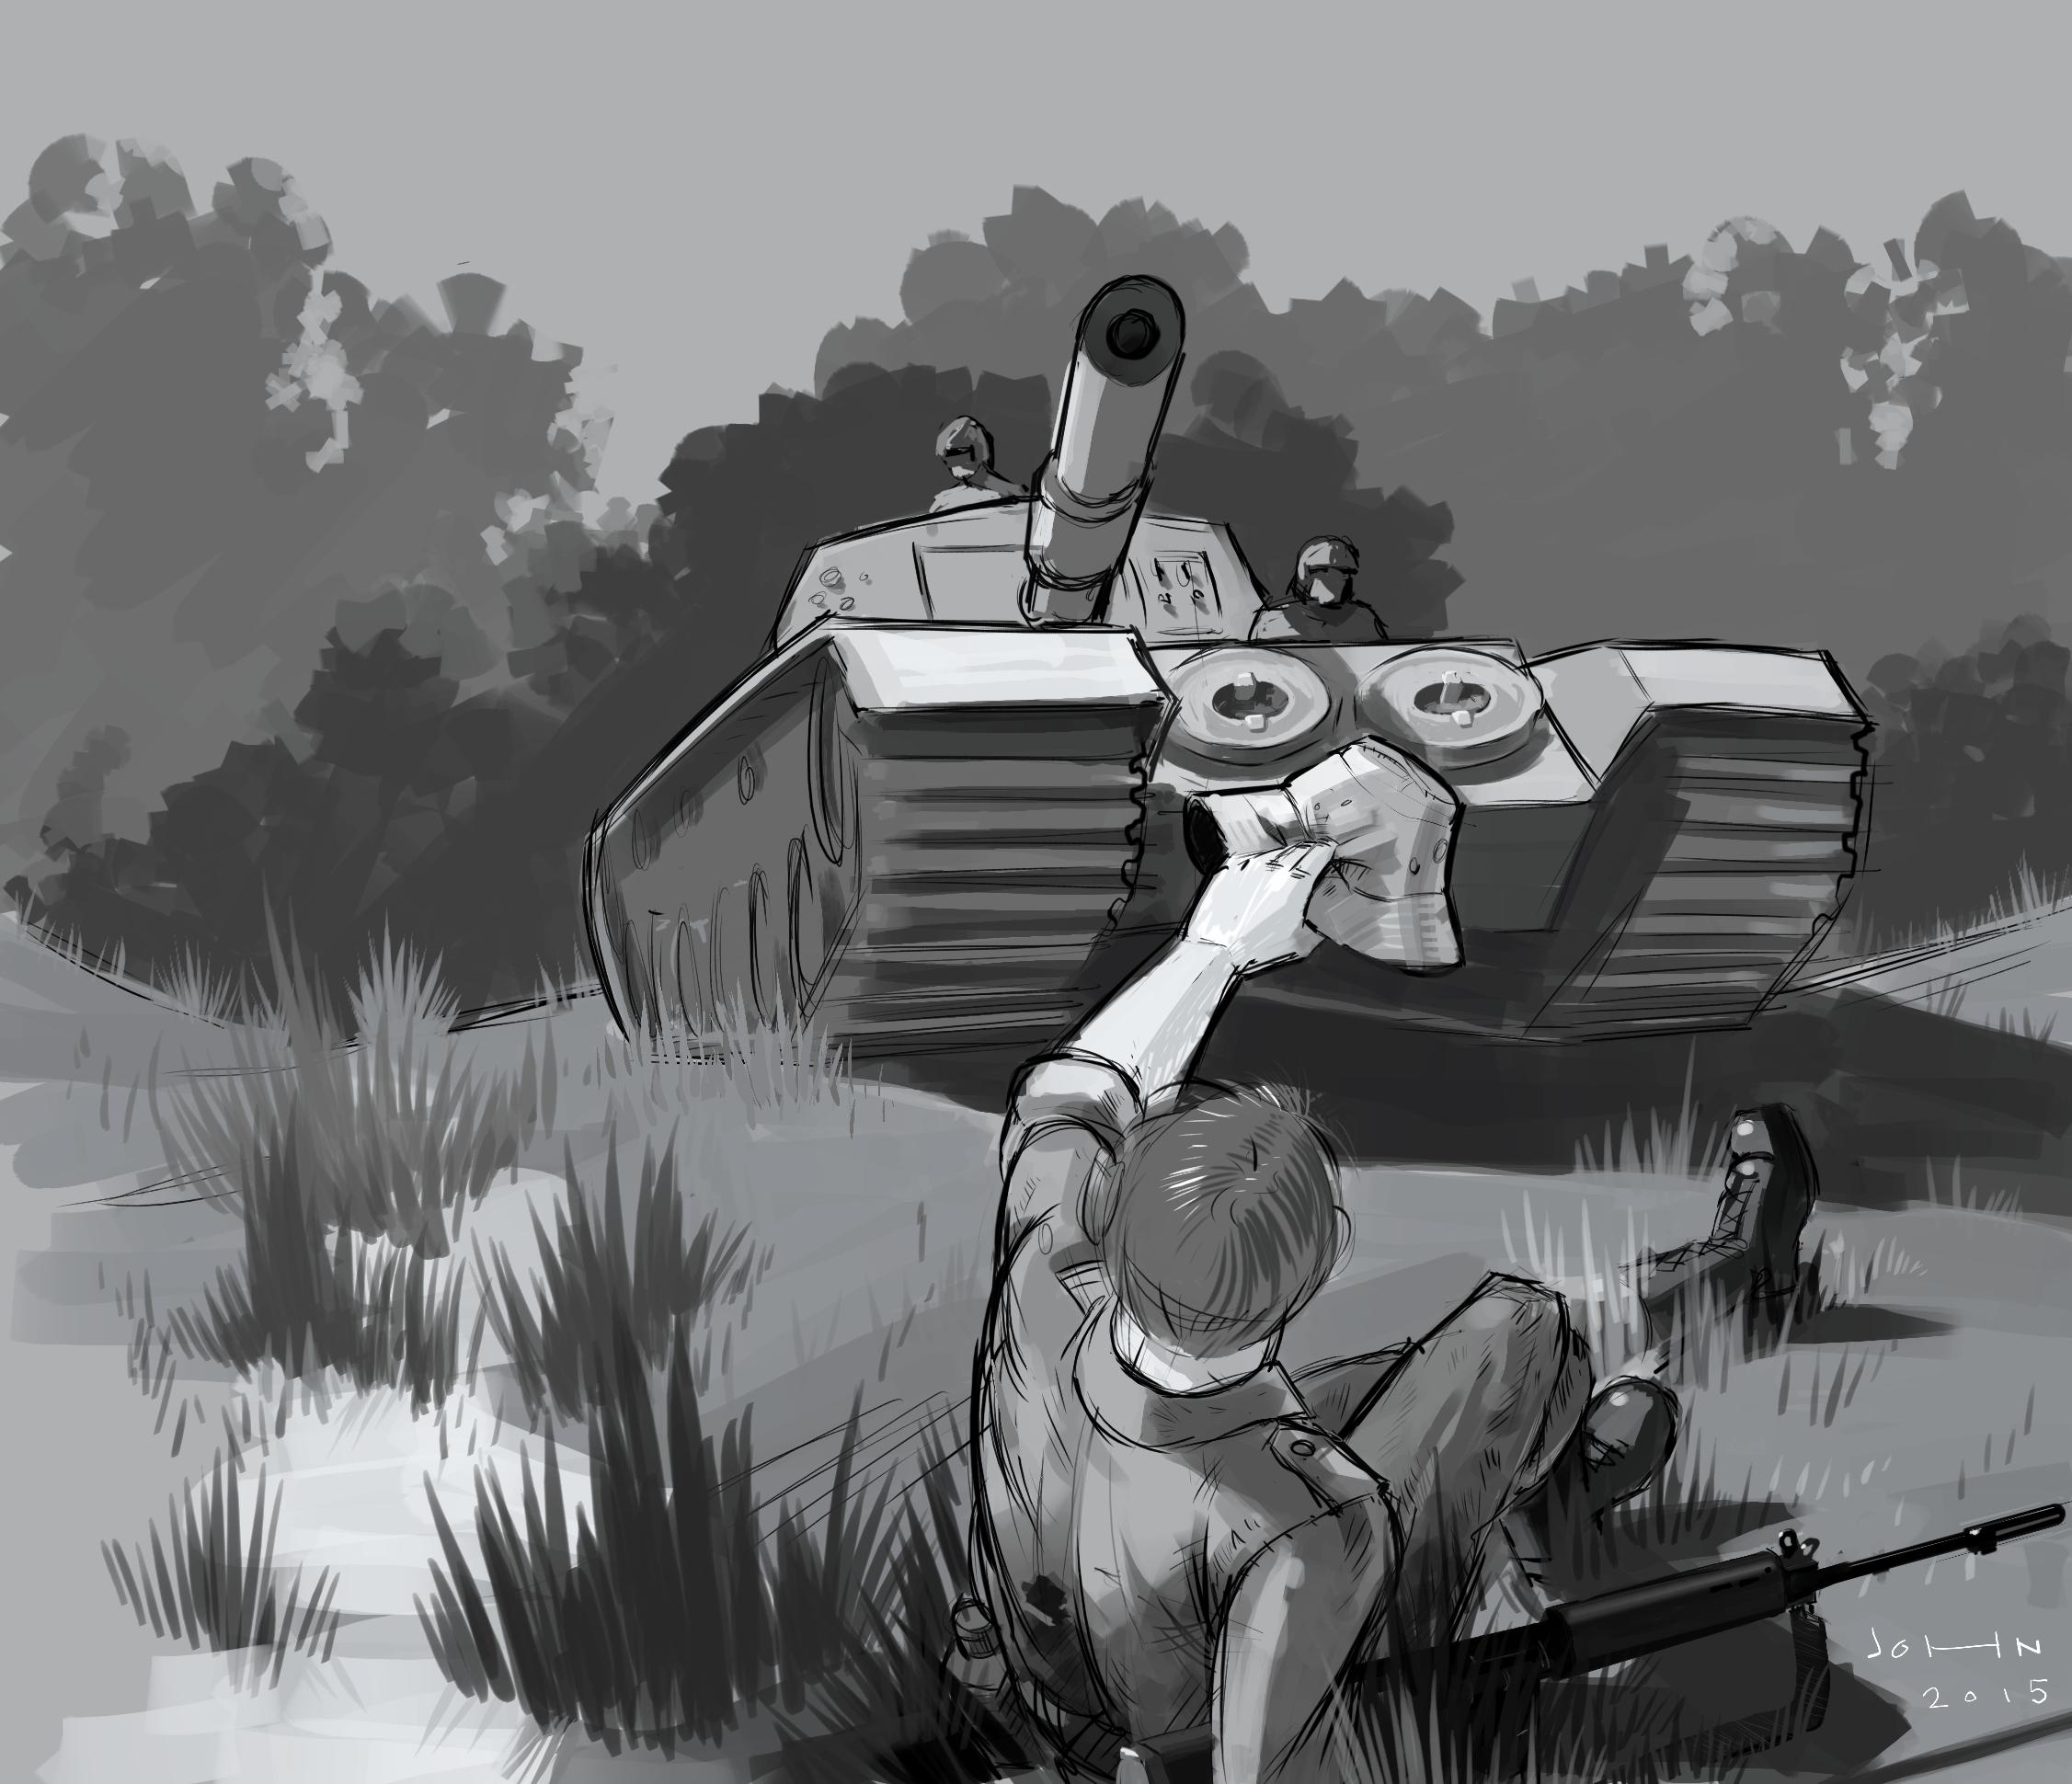 Digital illustration depicting a true event of an Australian digger's rescue in the Vietnam War.